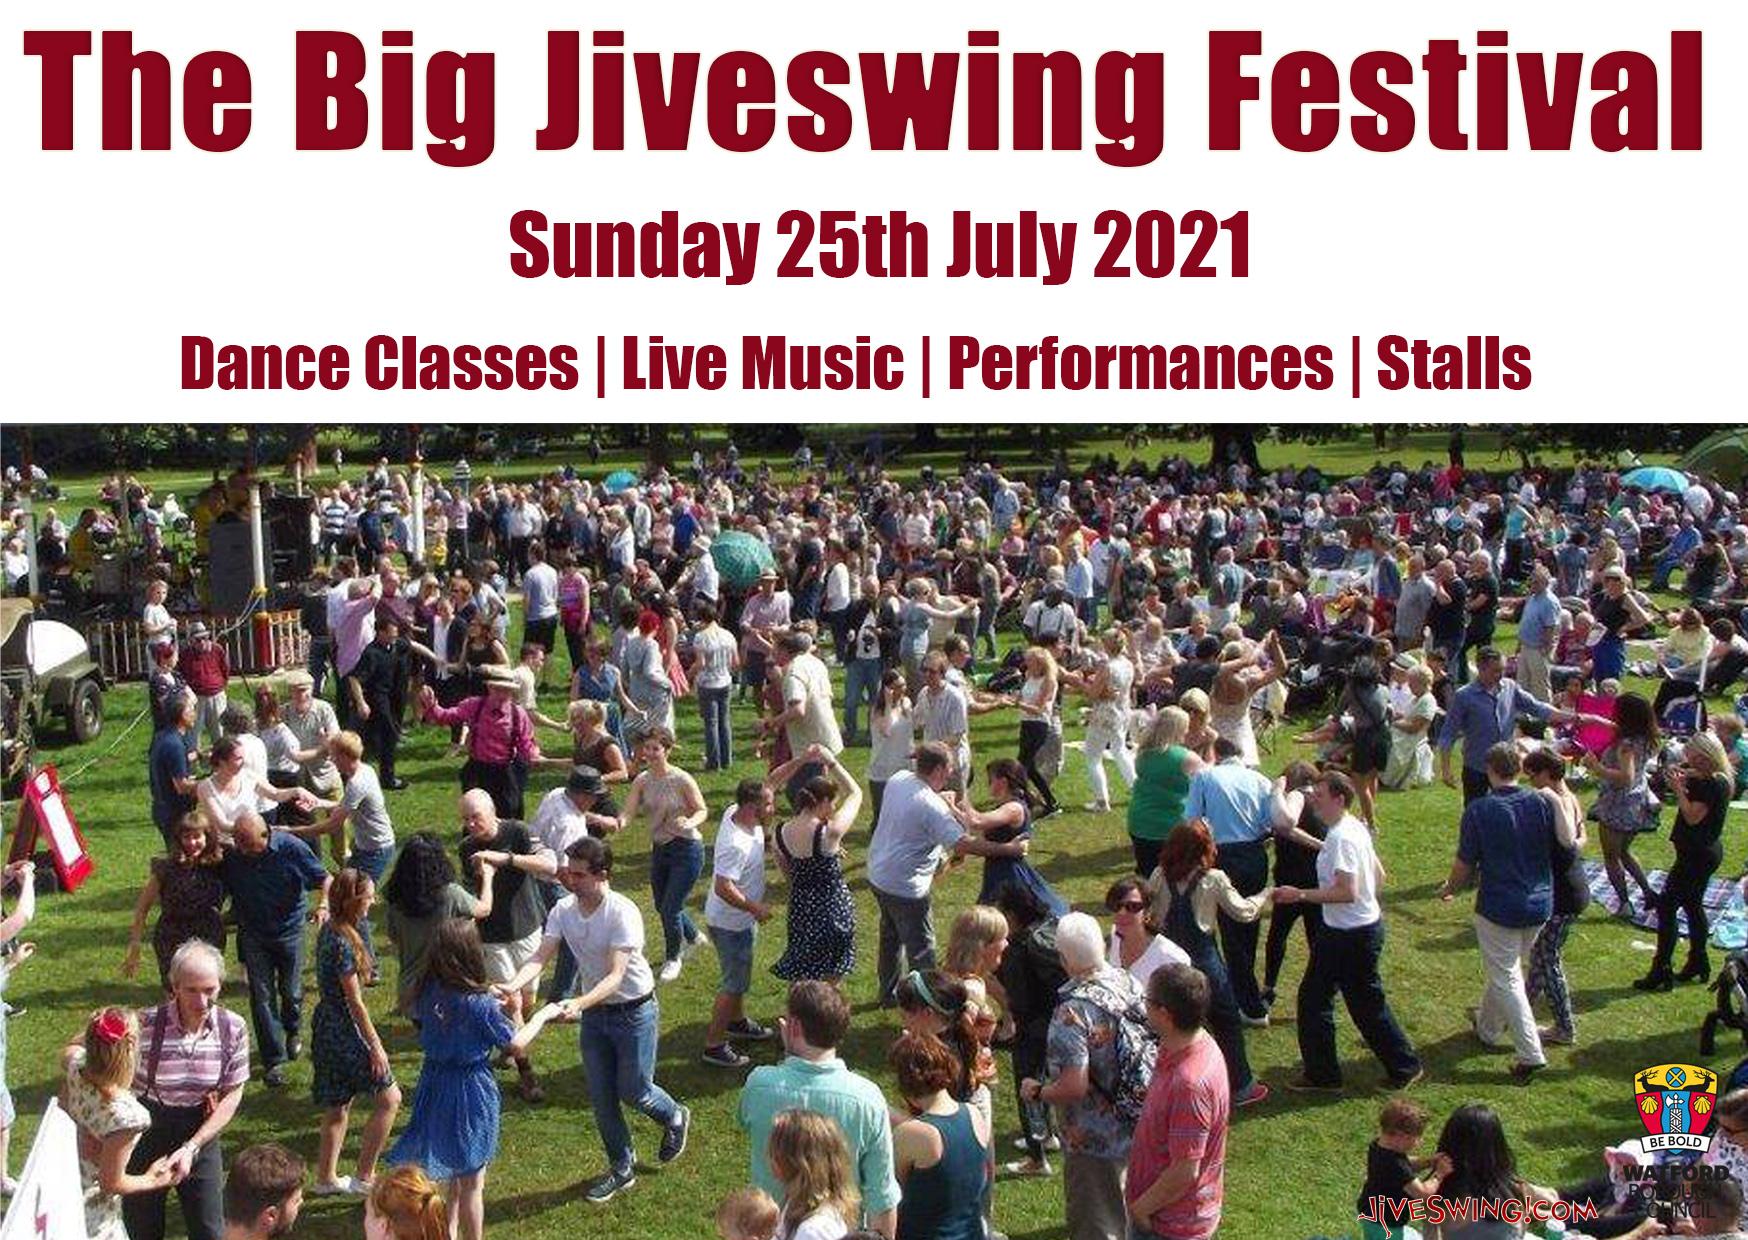 The Big Jiveswing Festival 2021